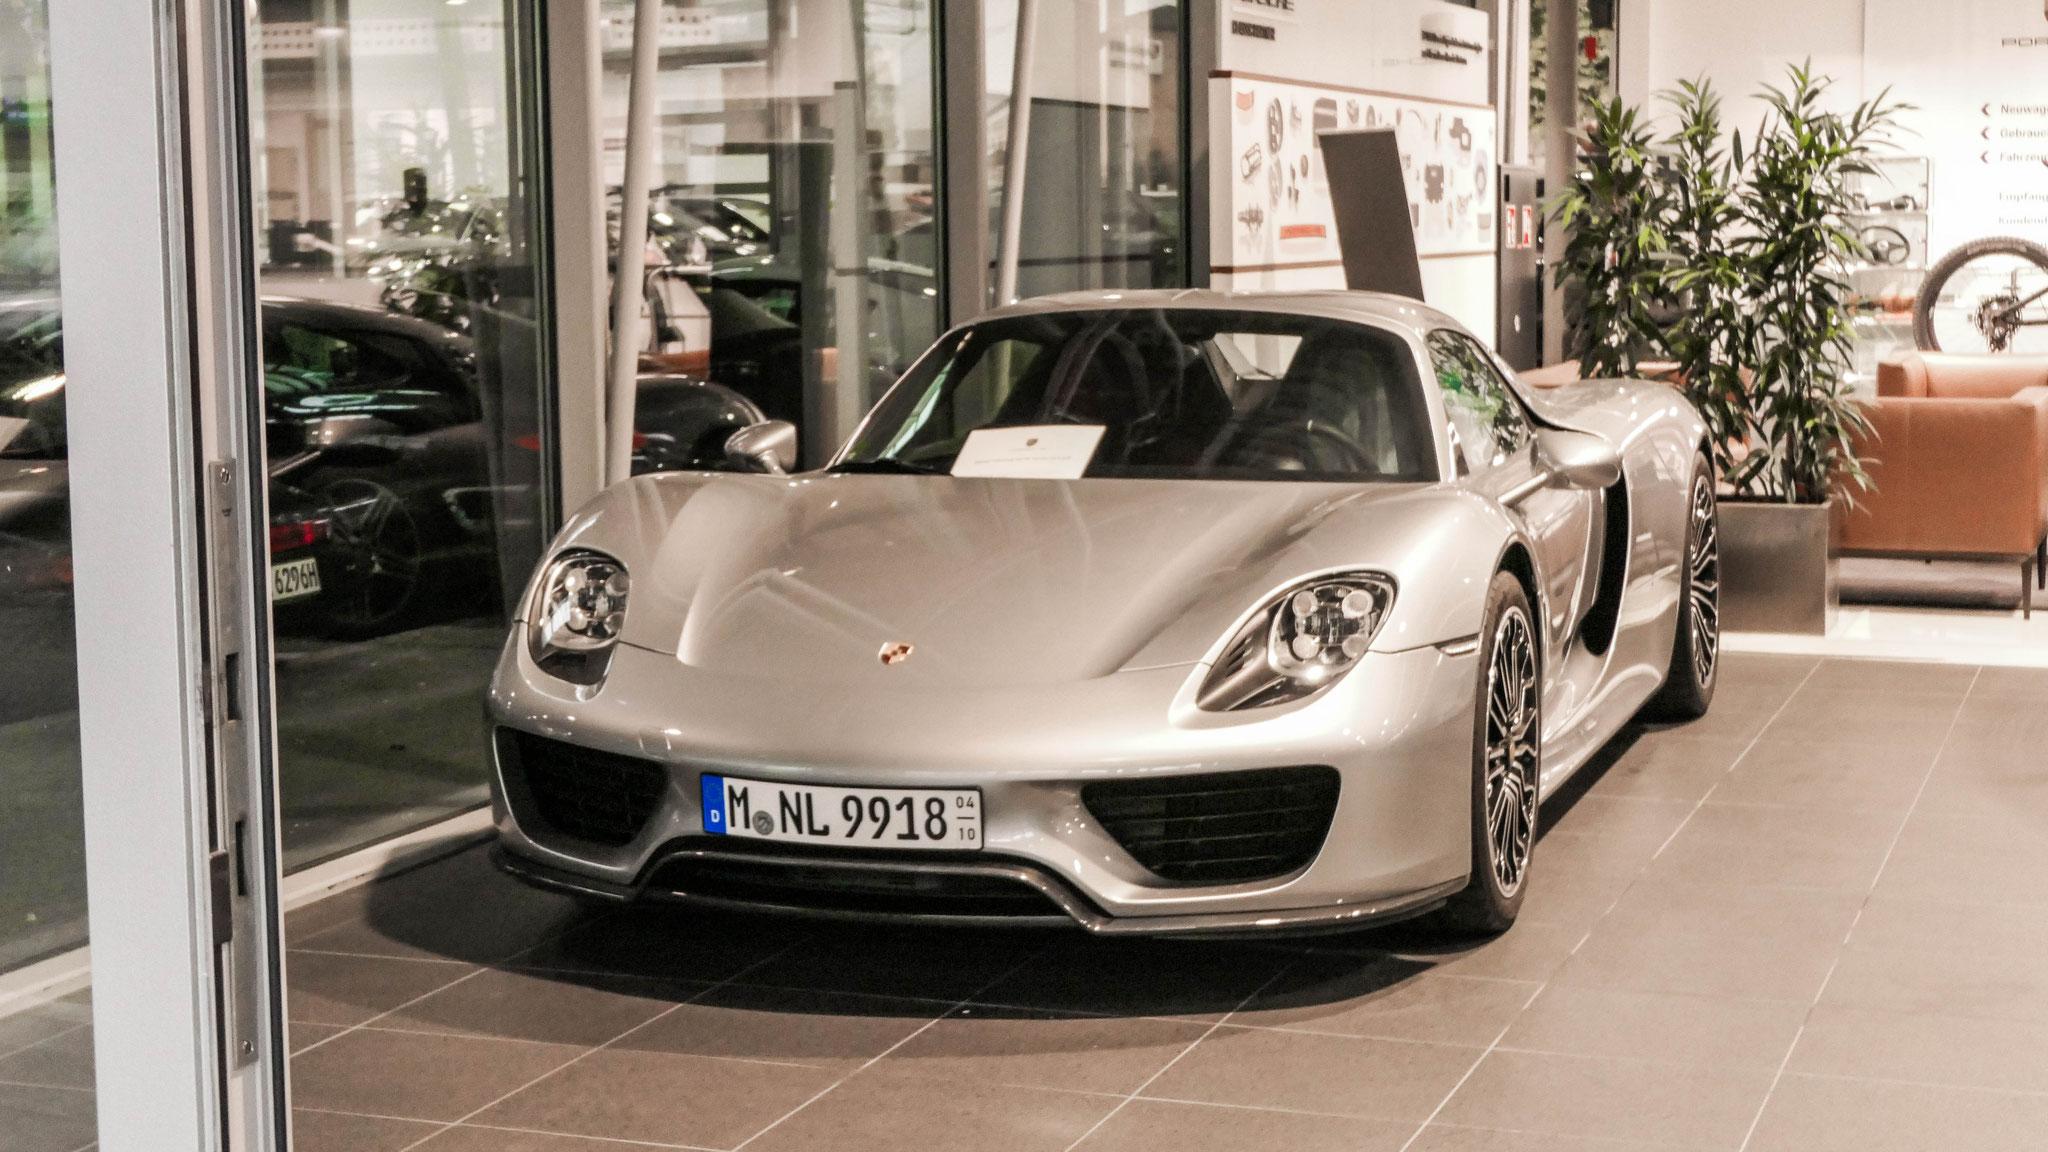 Porsche 918 Spyder - M-NL-9918